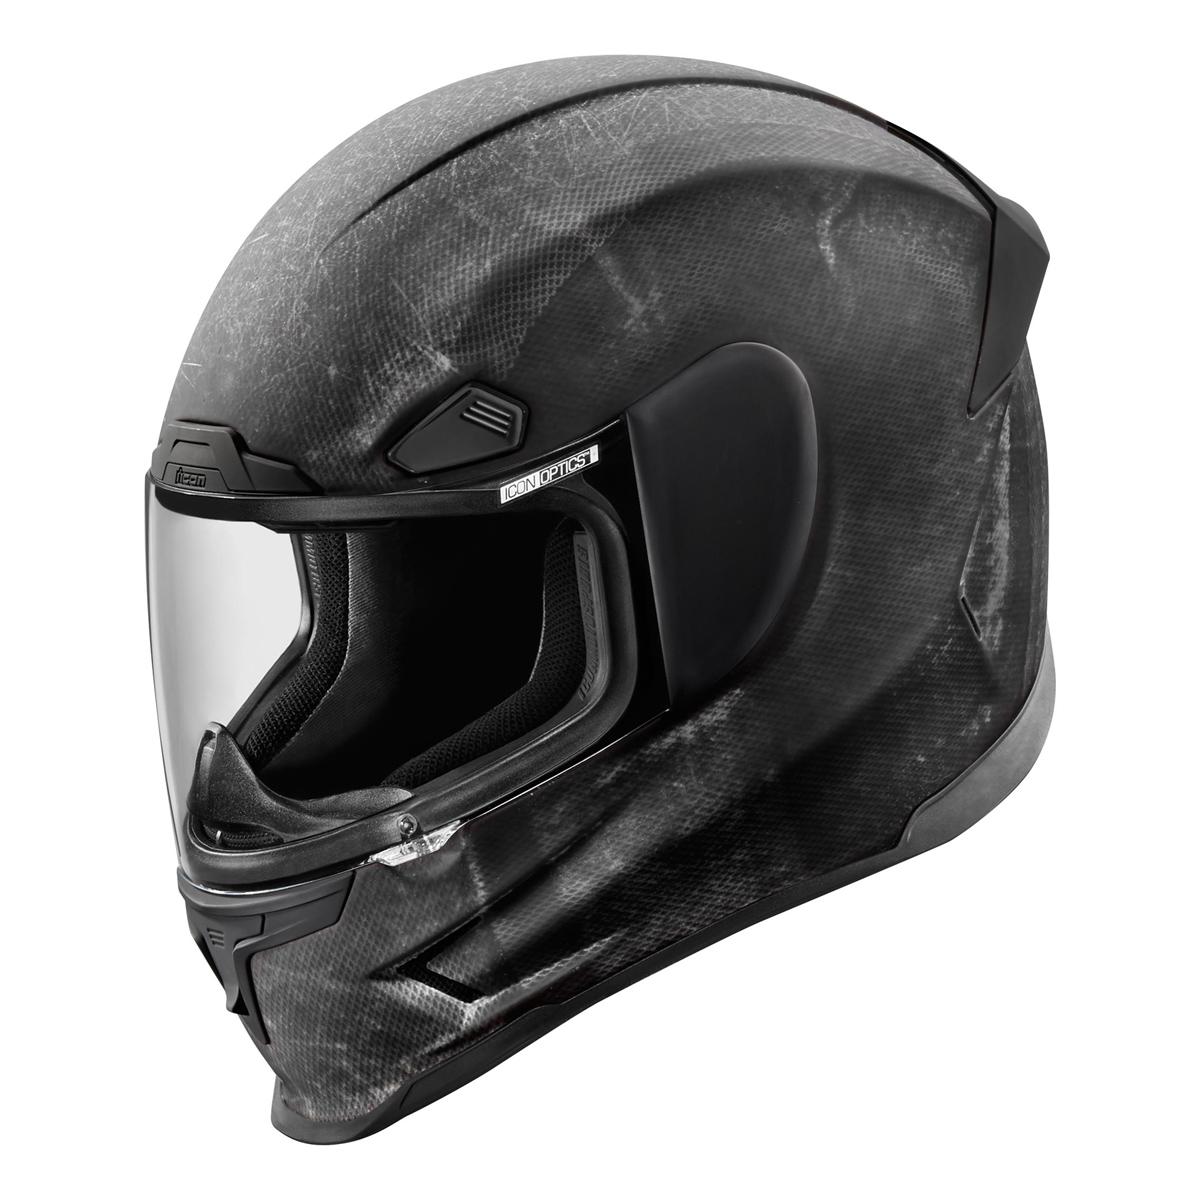 ICON Airframe Pro Construct Black Full Face Helmet